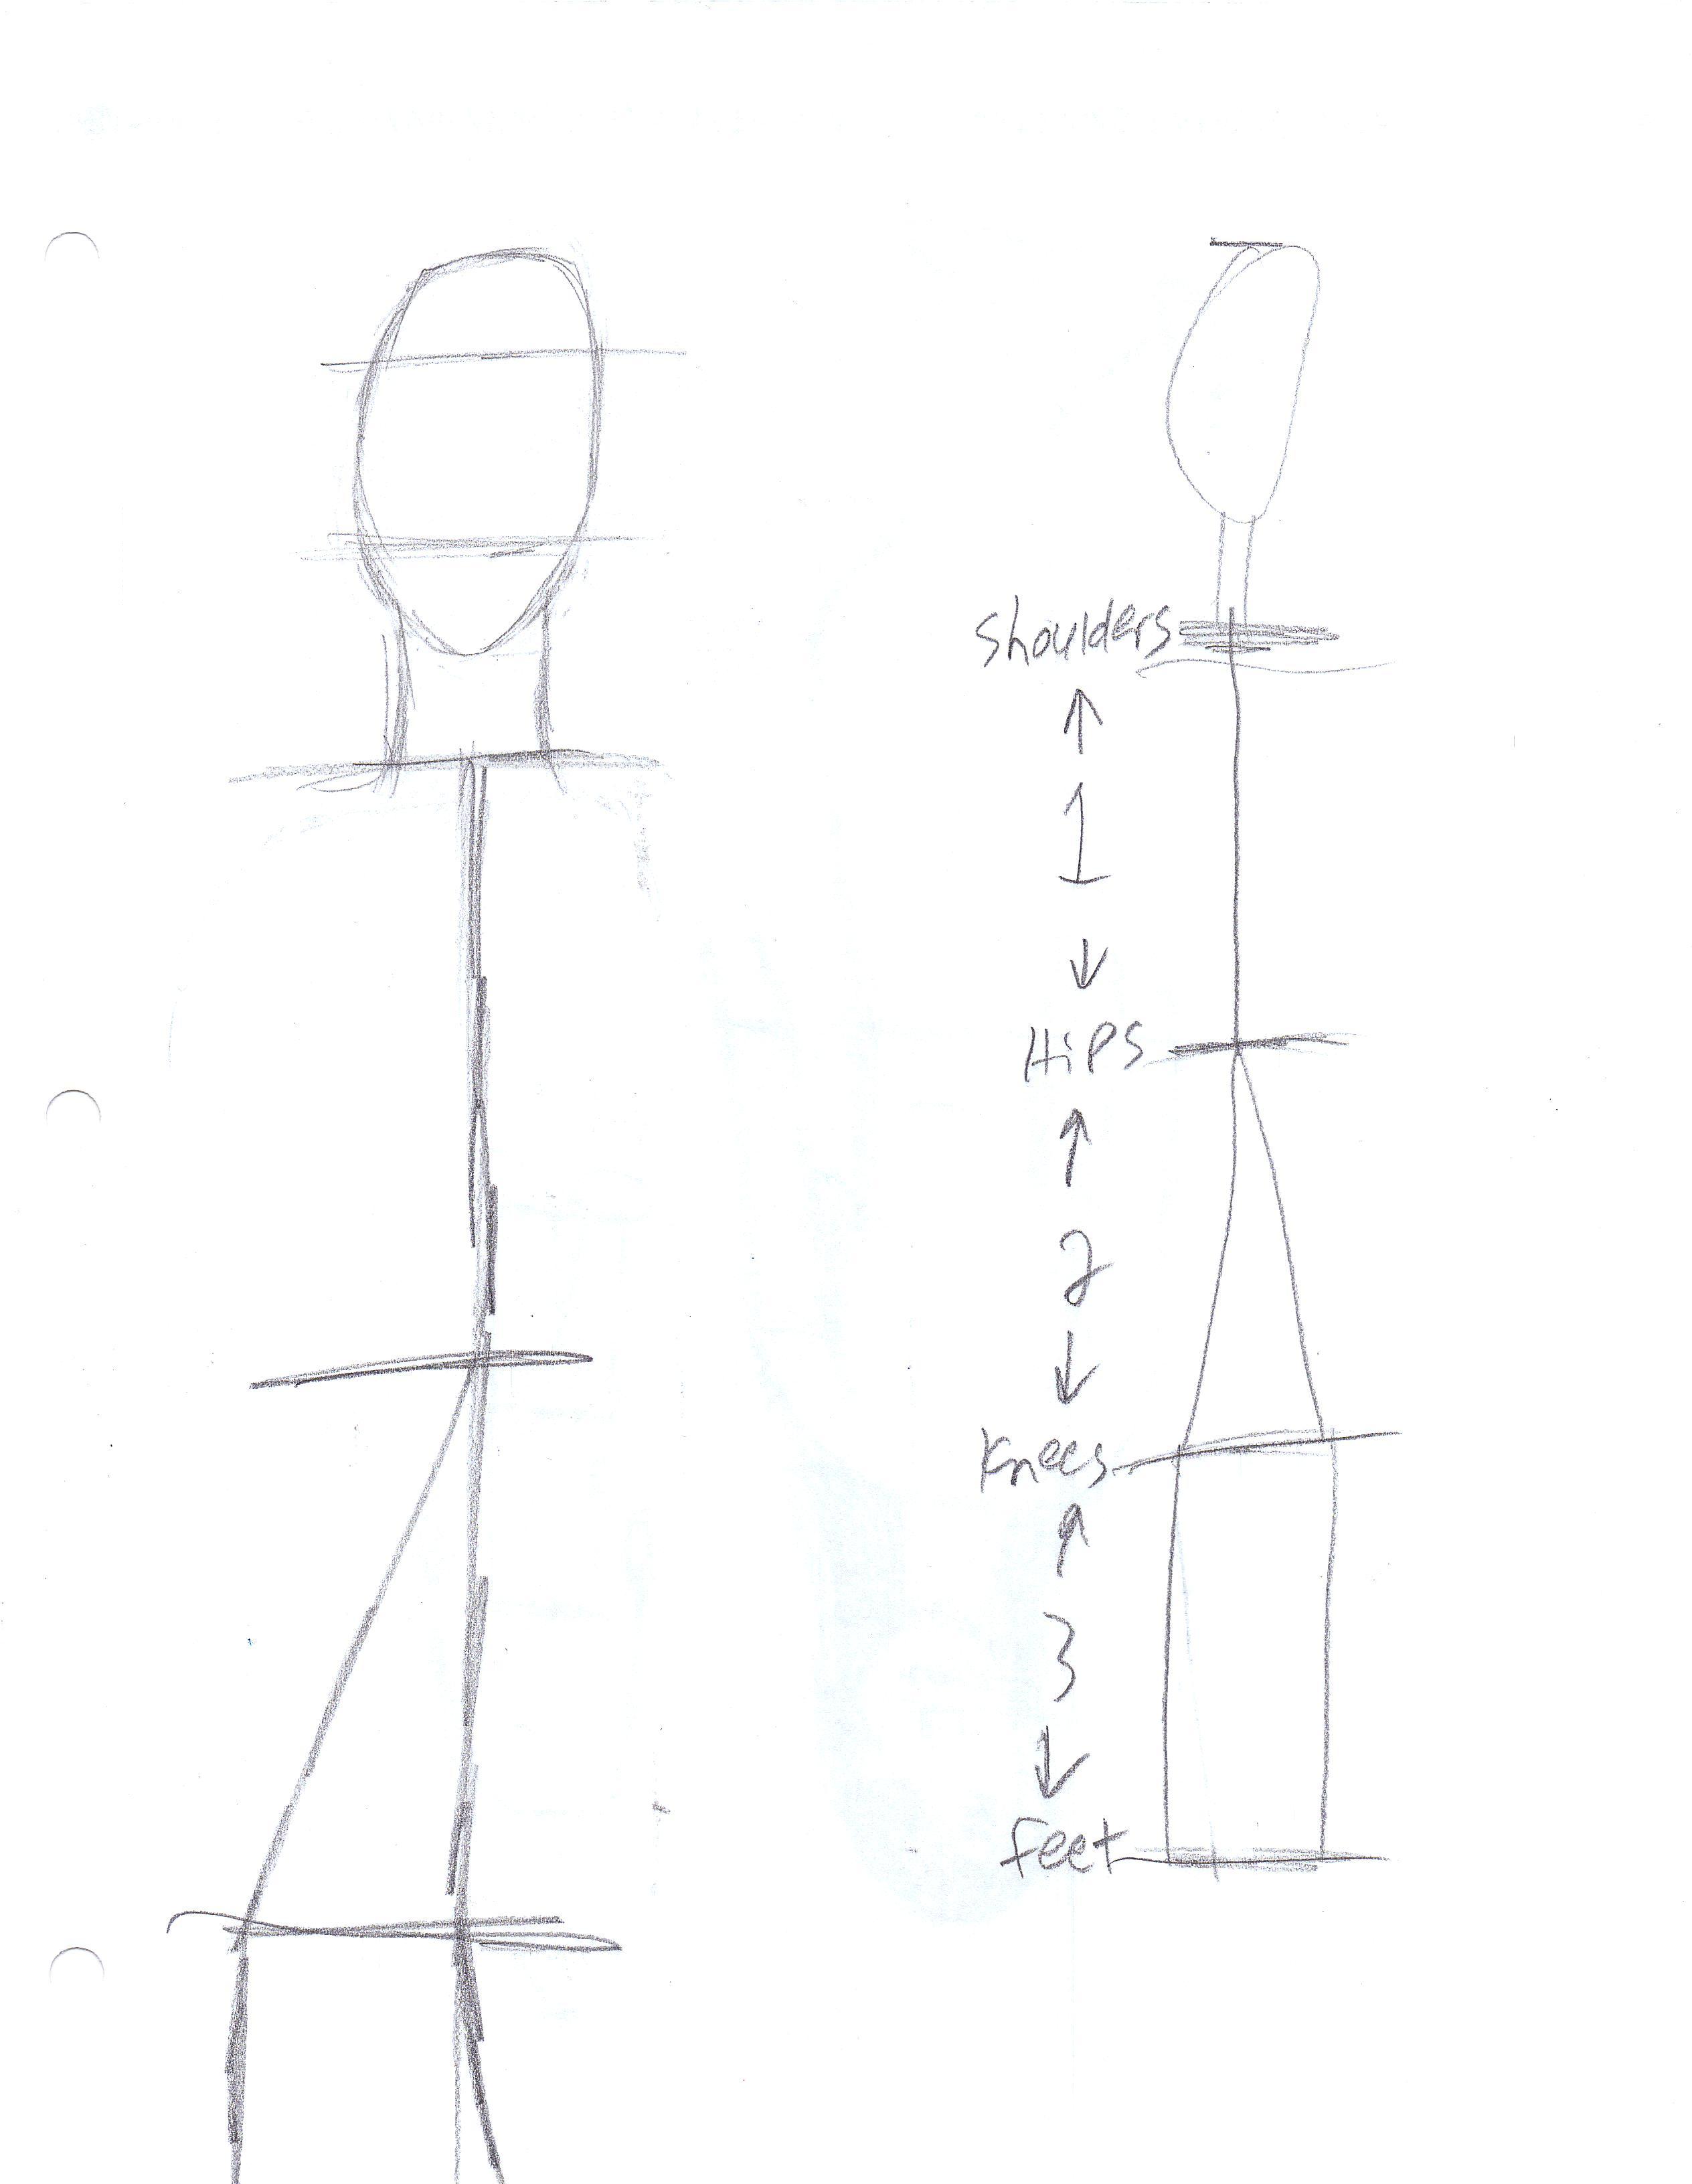 Birmingham, Ashley / Art II Lessons/Notes